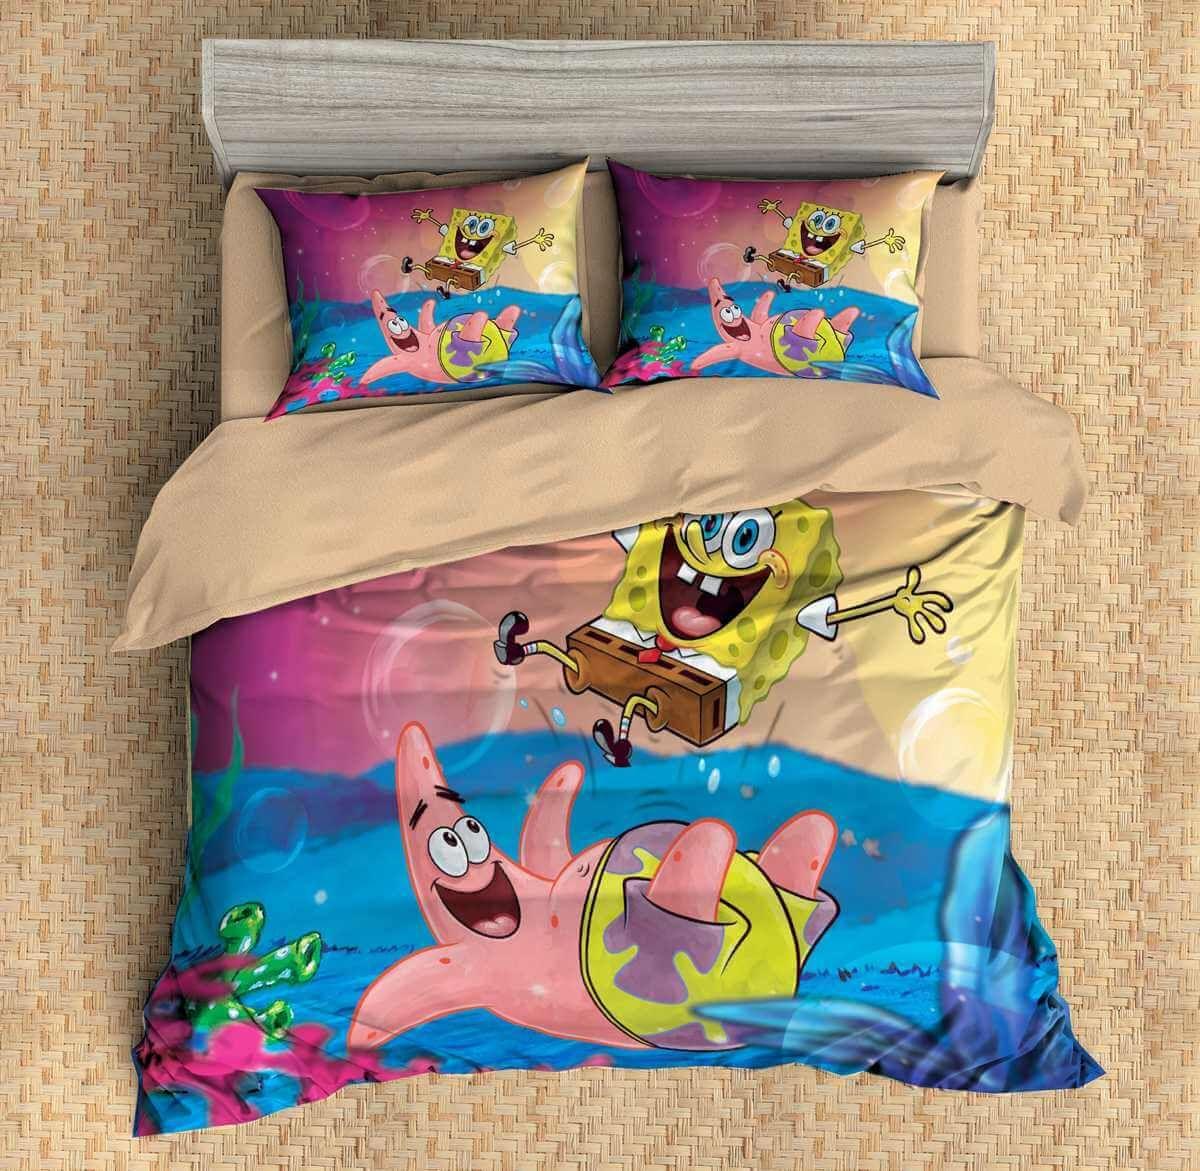 Customize Spongebob Squarepants Bedding Set Duvet Cover Bedroom Bedlinen 1 100